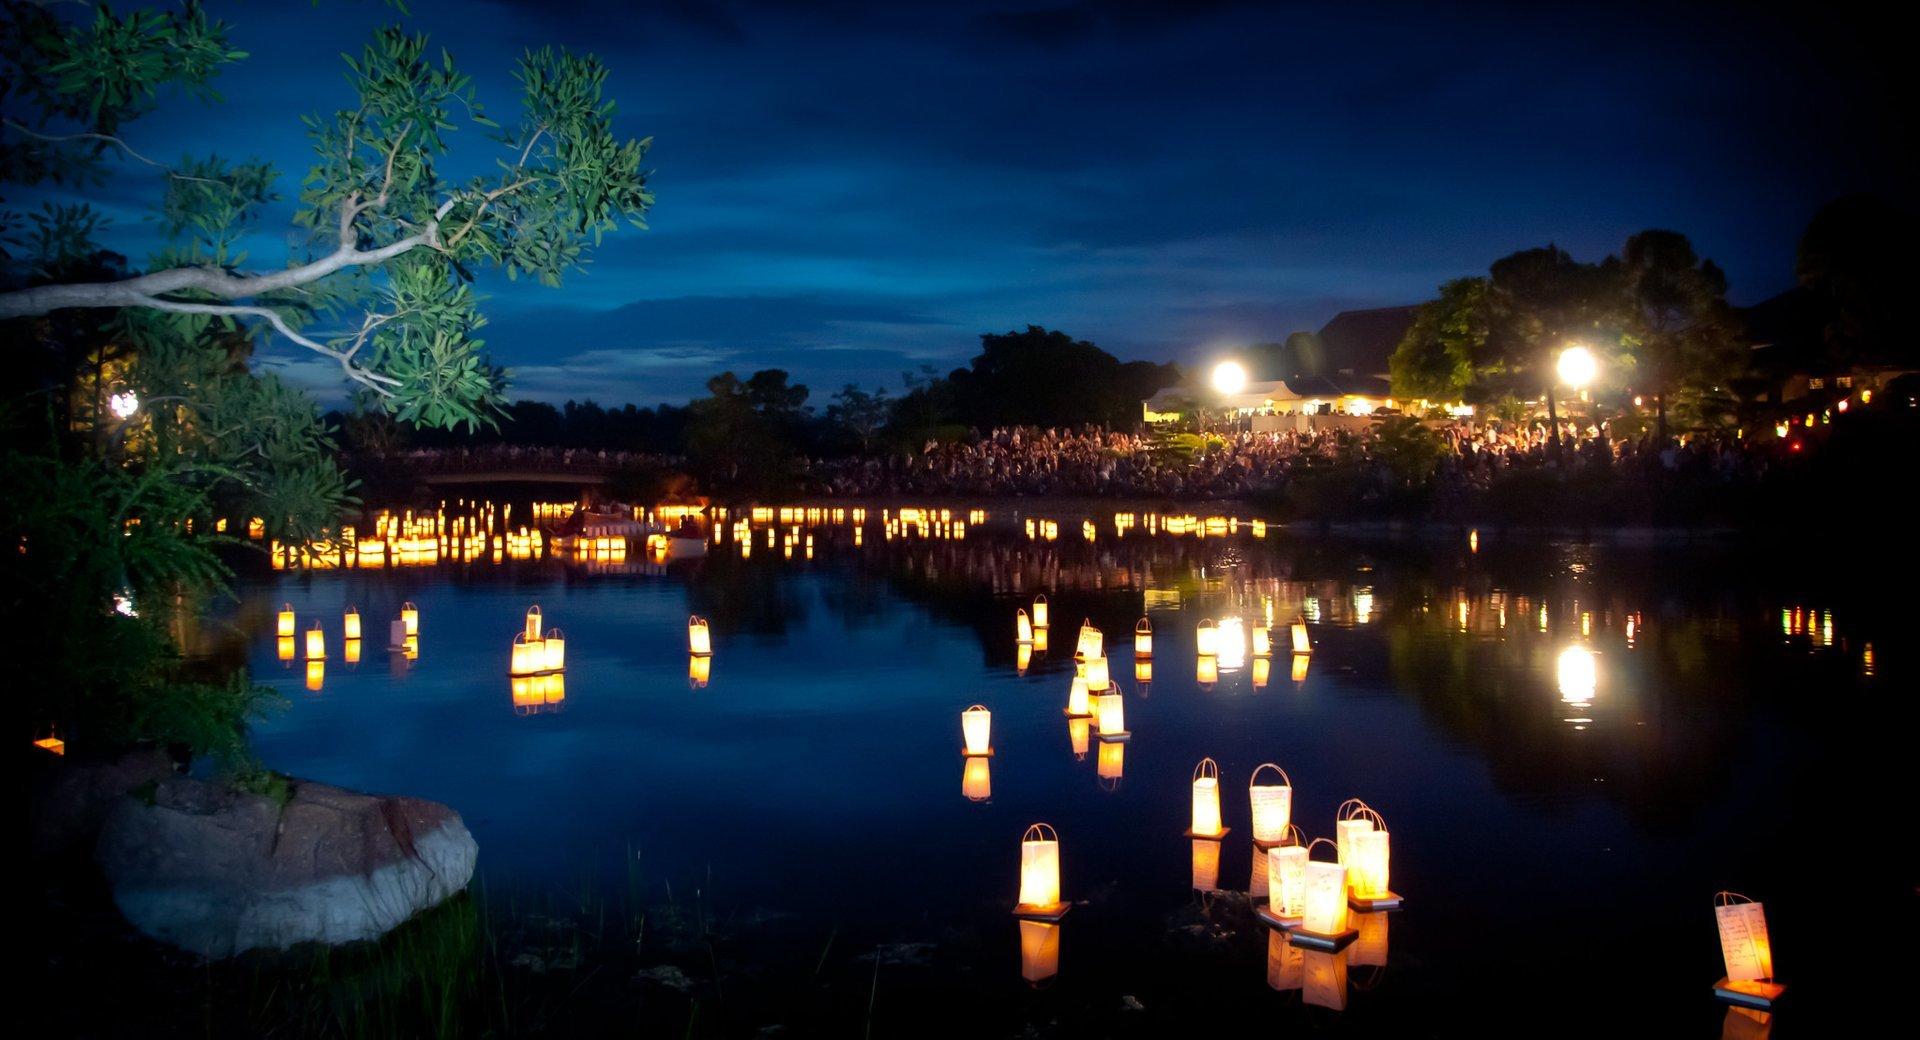 Obon Matsuri in Japan 2020 - Best Time